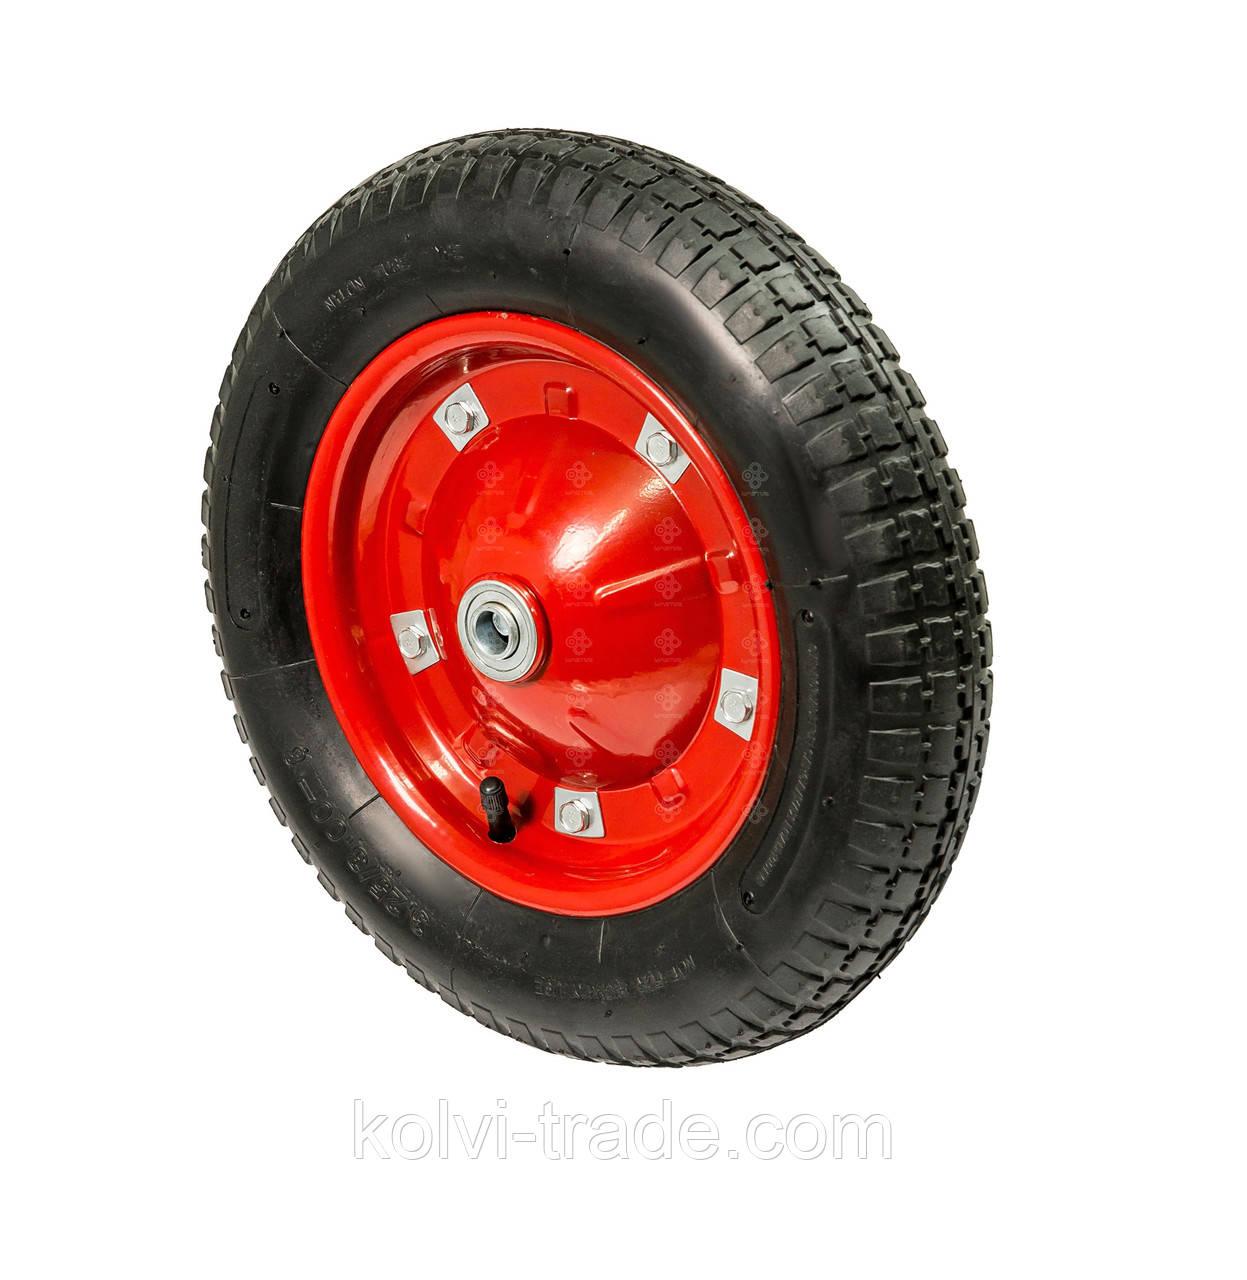 Колеса без кронштейна Серия 28 с шариковыми подшипниками Диаметр: 400мм.